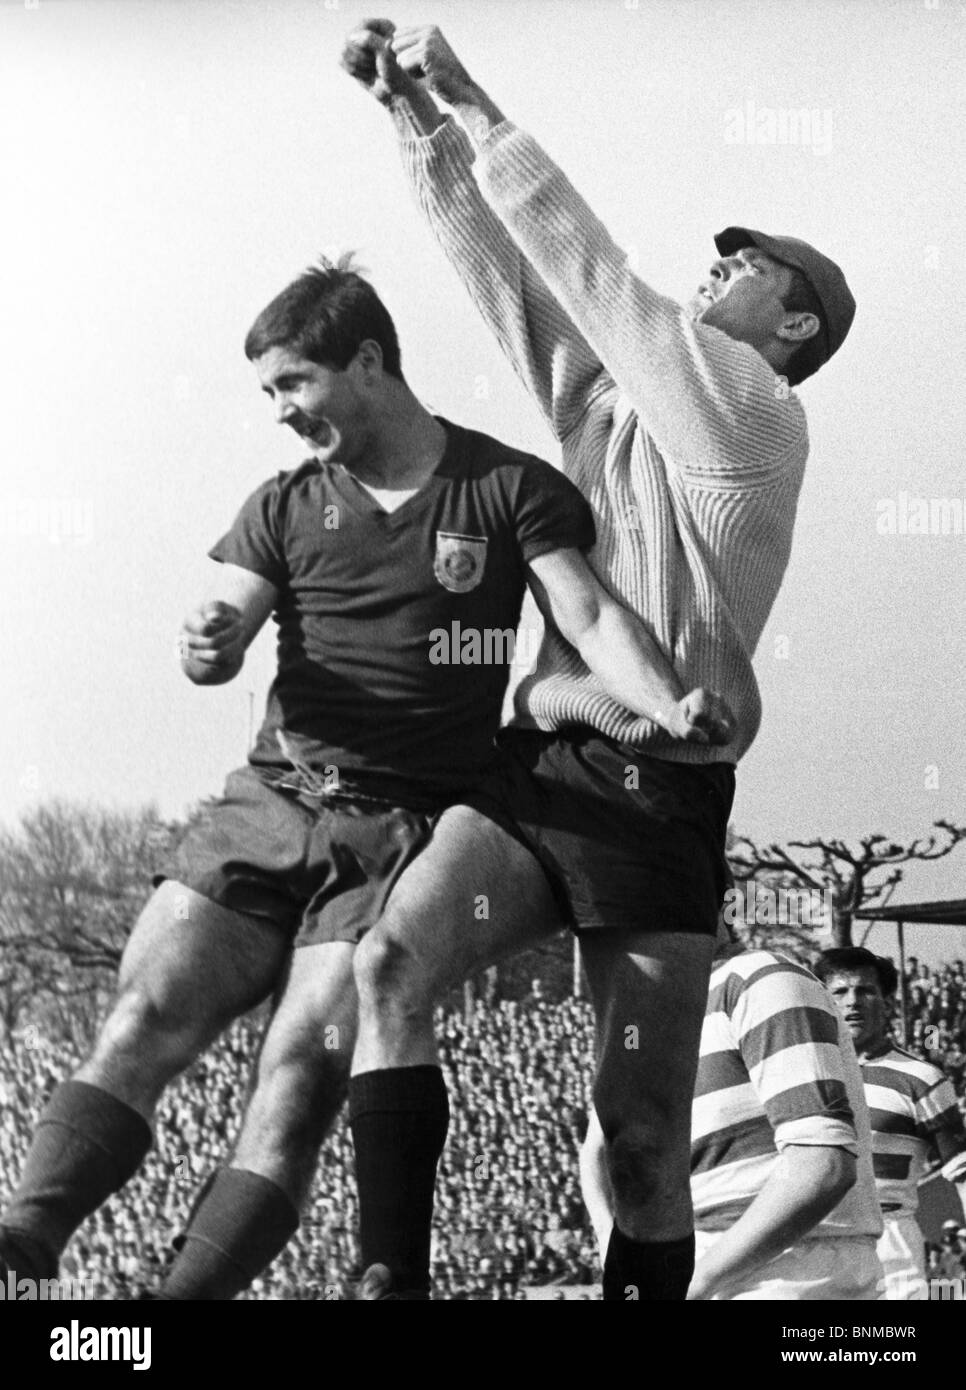 1966 1967 ball Bavaria federal league Germany football soccer footballer professional football player football soccer - Stock Image